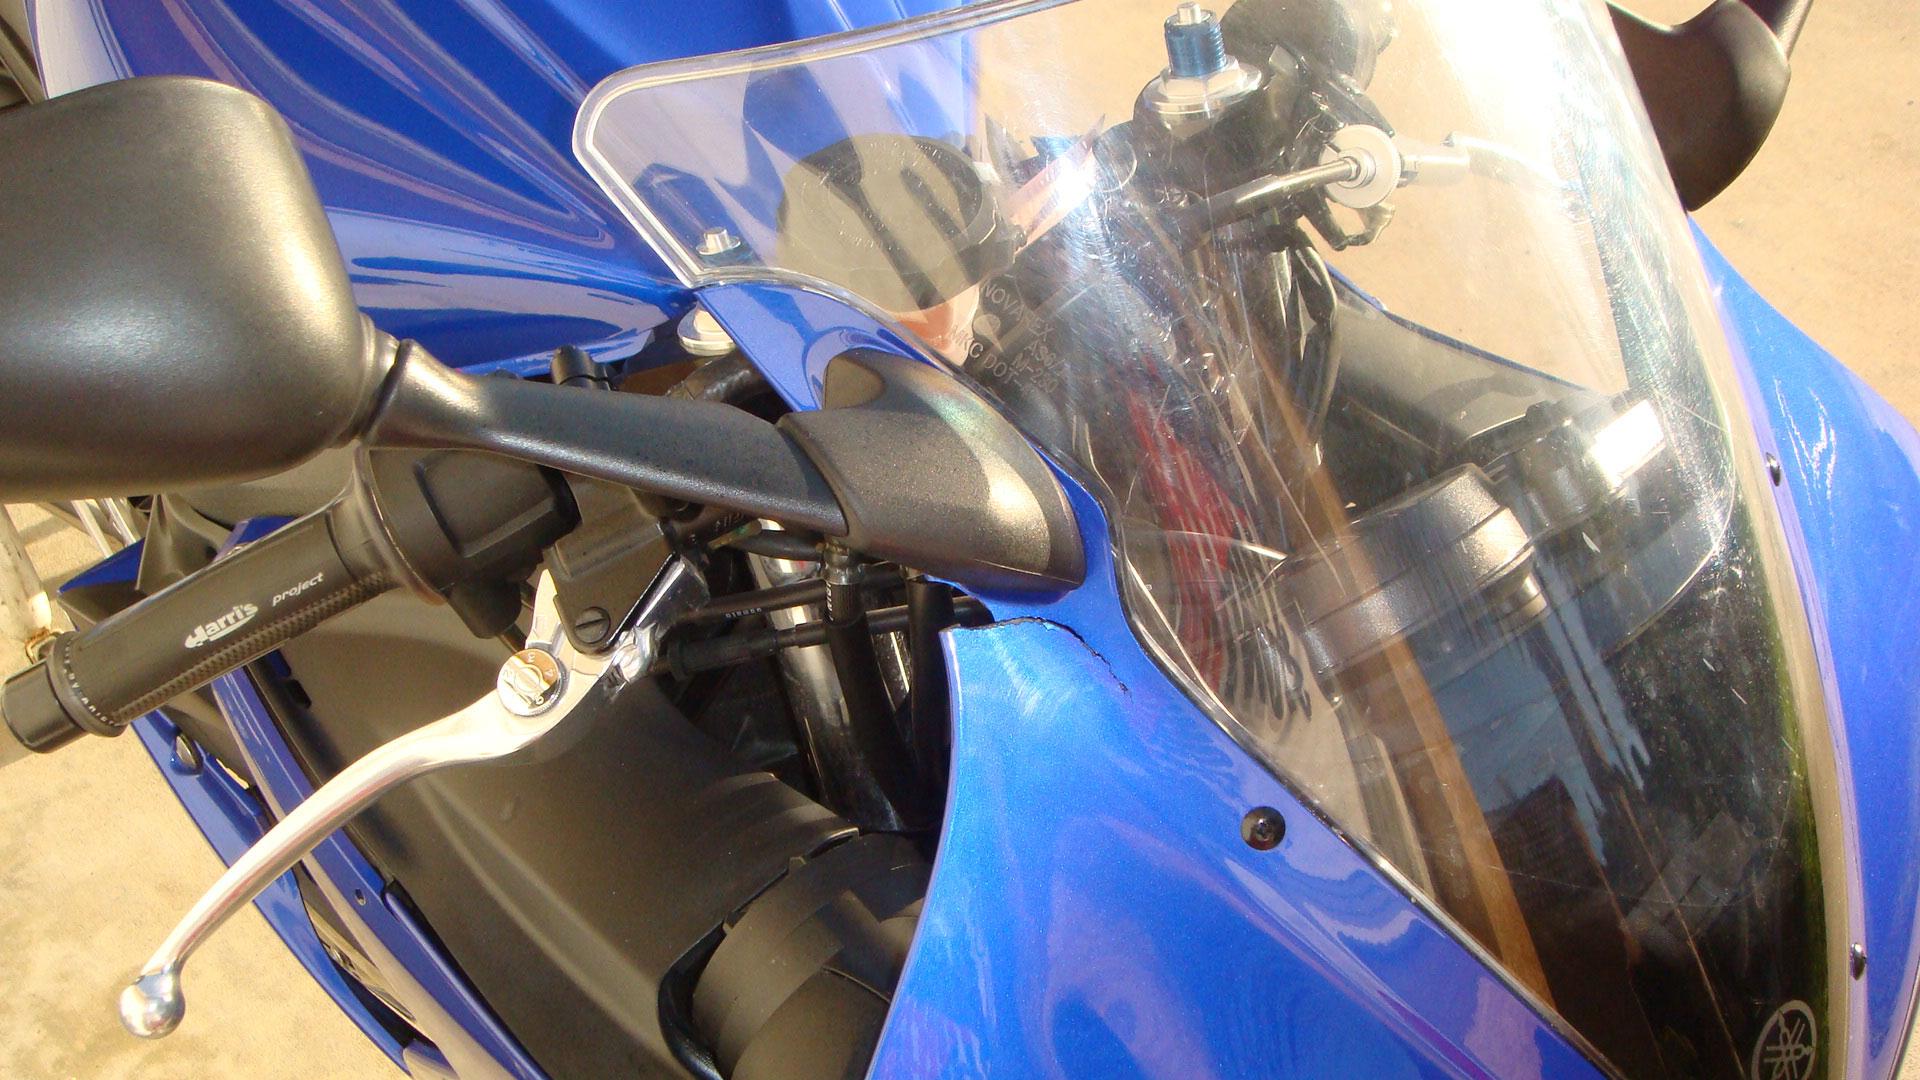 2007 Yamaha R6 - $4500 in SAN DIEGO, CA  - Sportbikes net